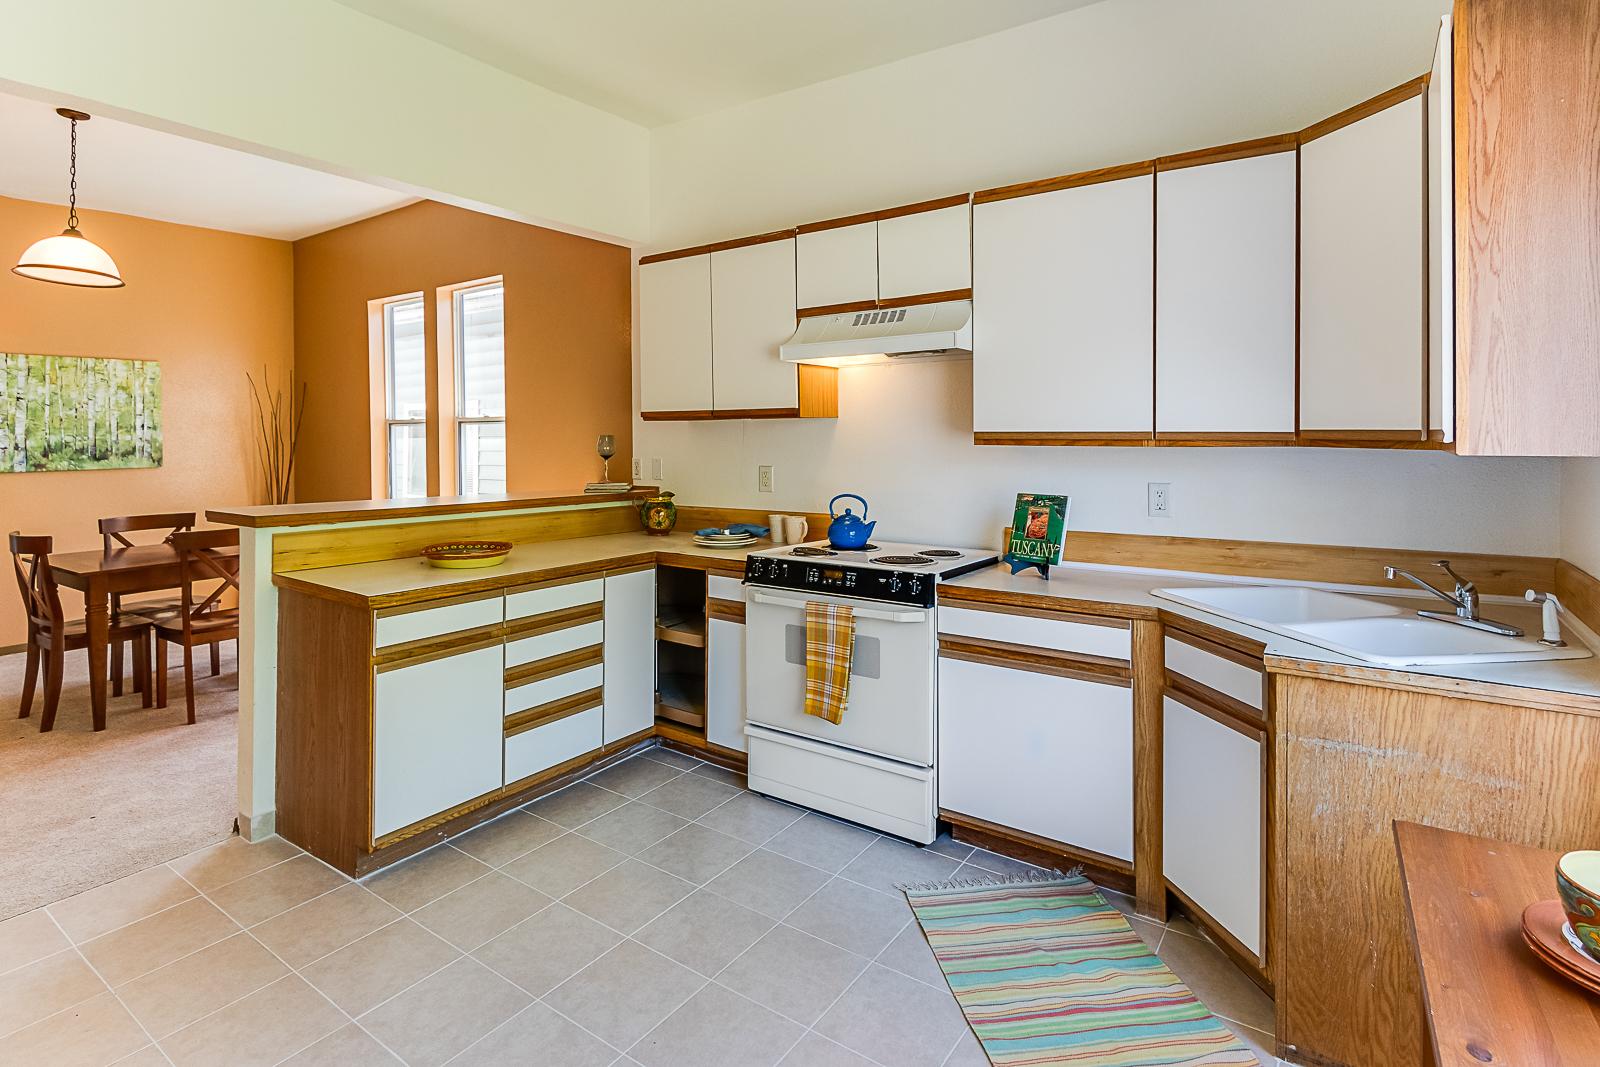 kitchenDining-7577-PRINTS.jpg